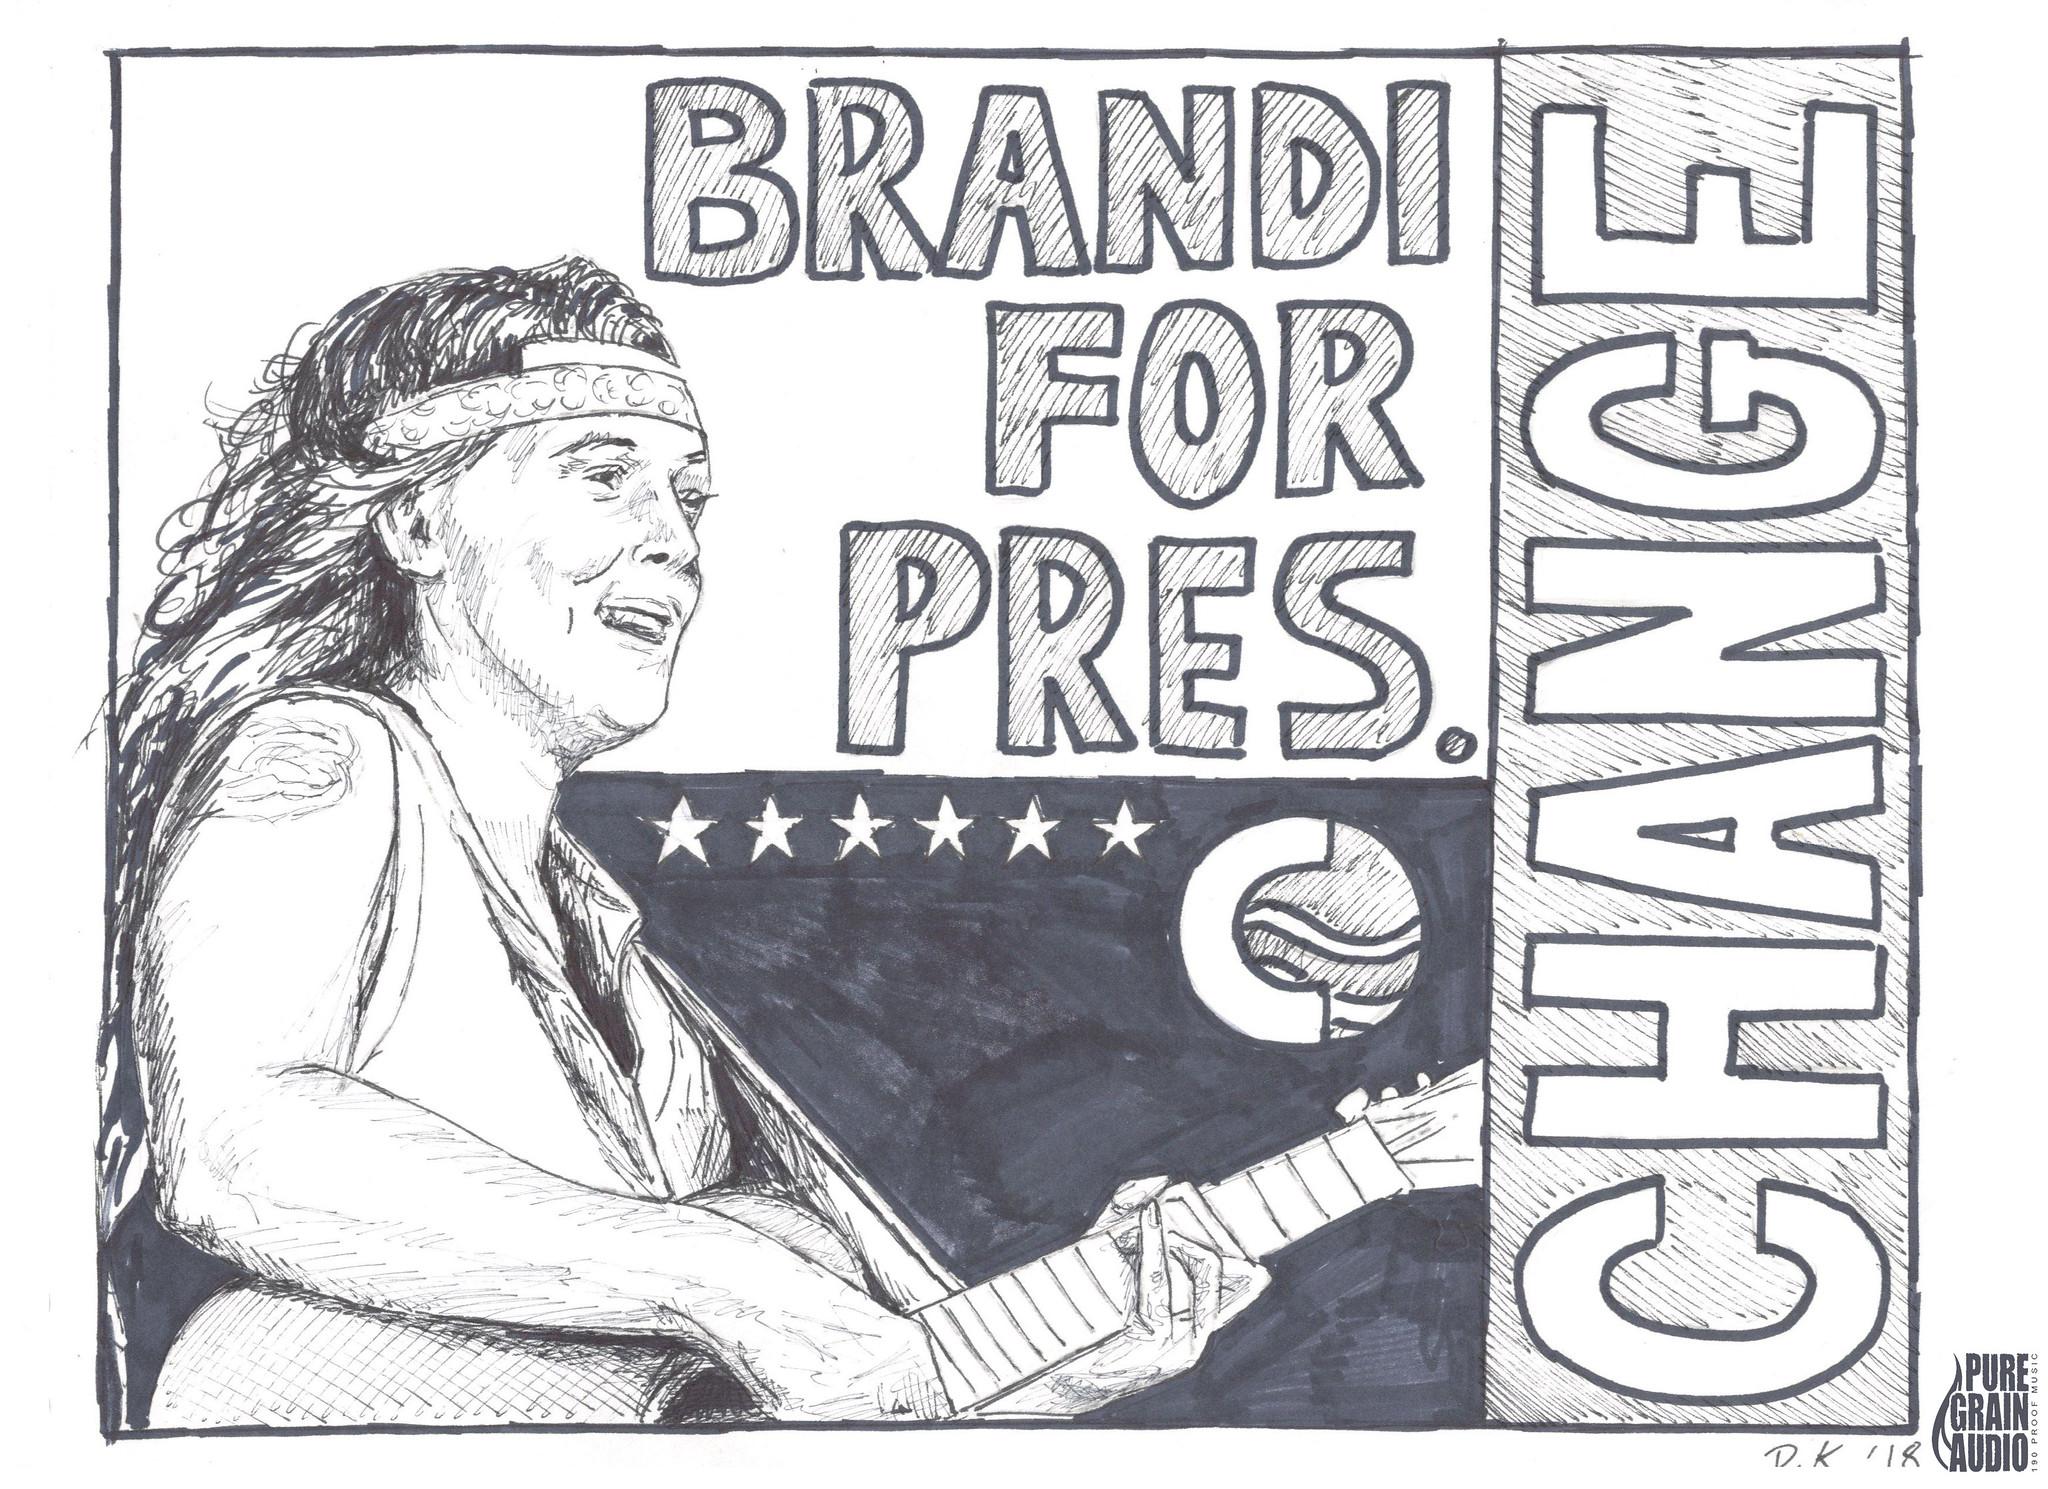 pensive_13_brandi_for_president_featuring_brandi_carlile